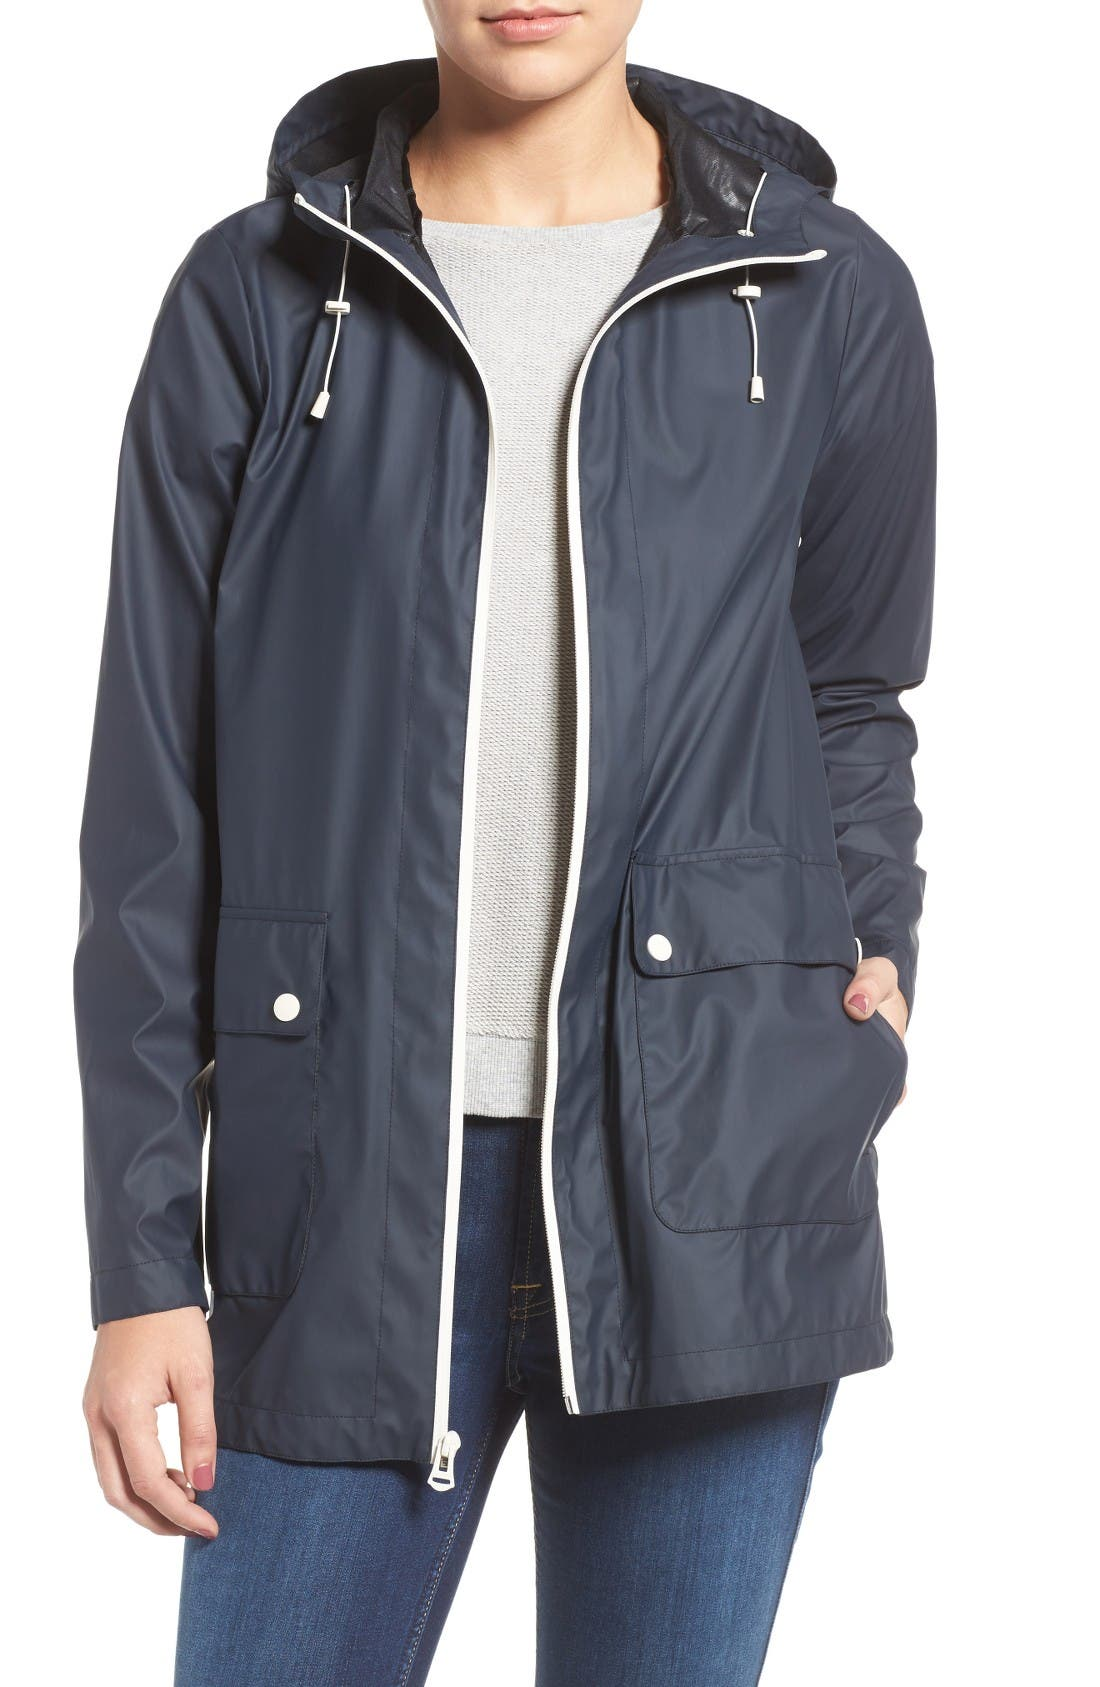 Alternate Image 1 Selected - Cole Haan Hooded Rain Jacket